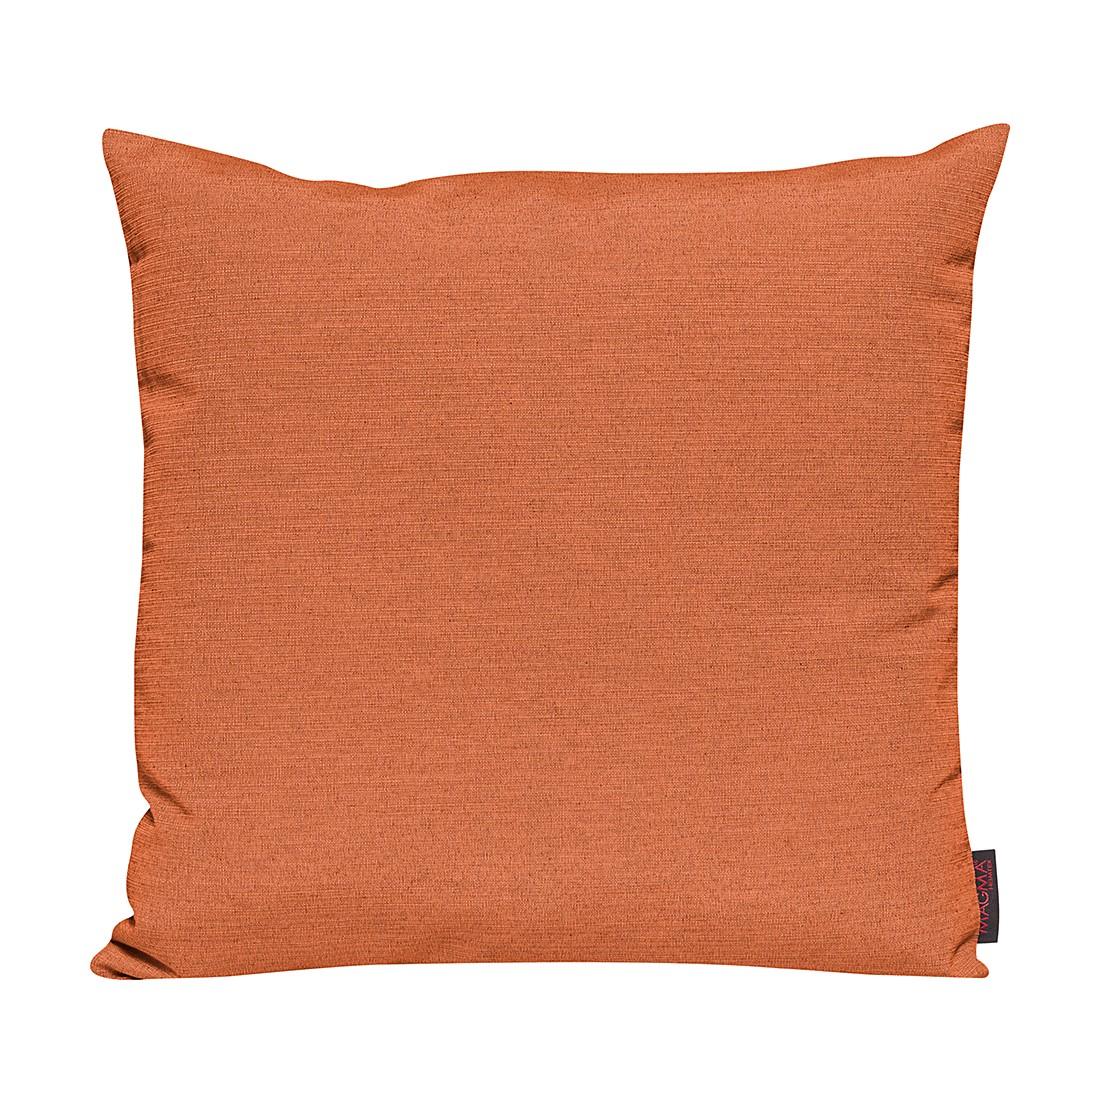 Kussenhoes Franca - oranje Kussensloop Franca - oranje - 50x50cm, twentyfour